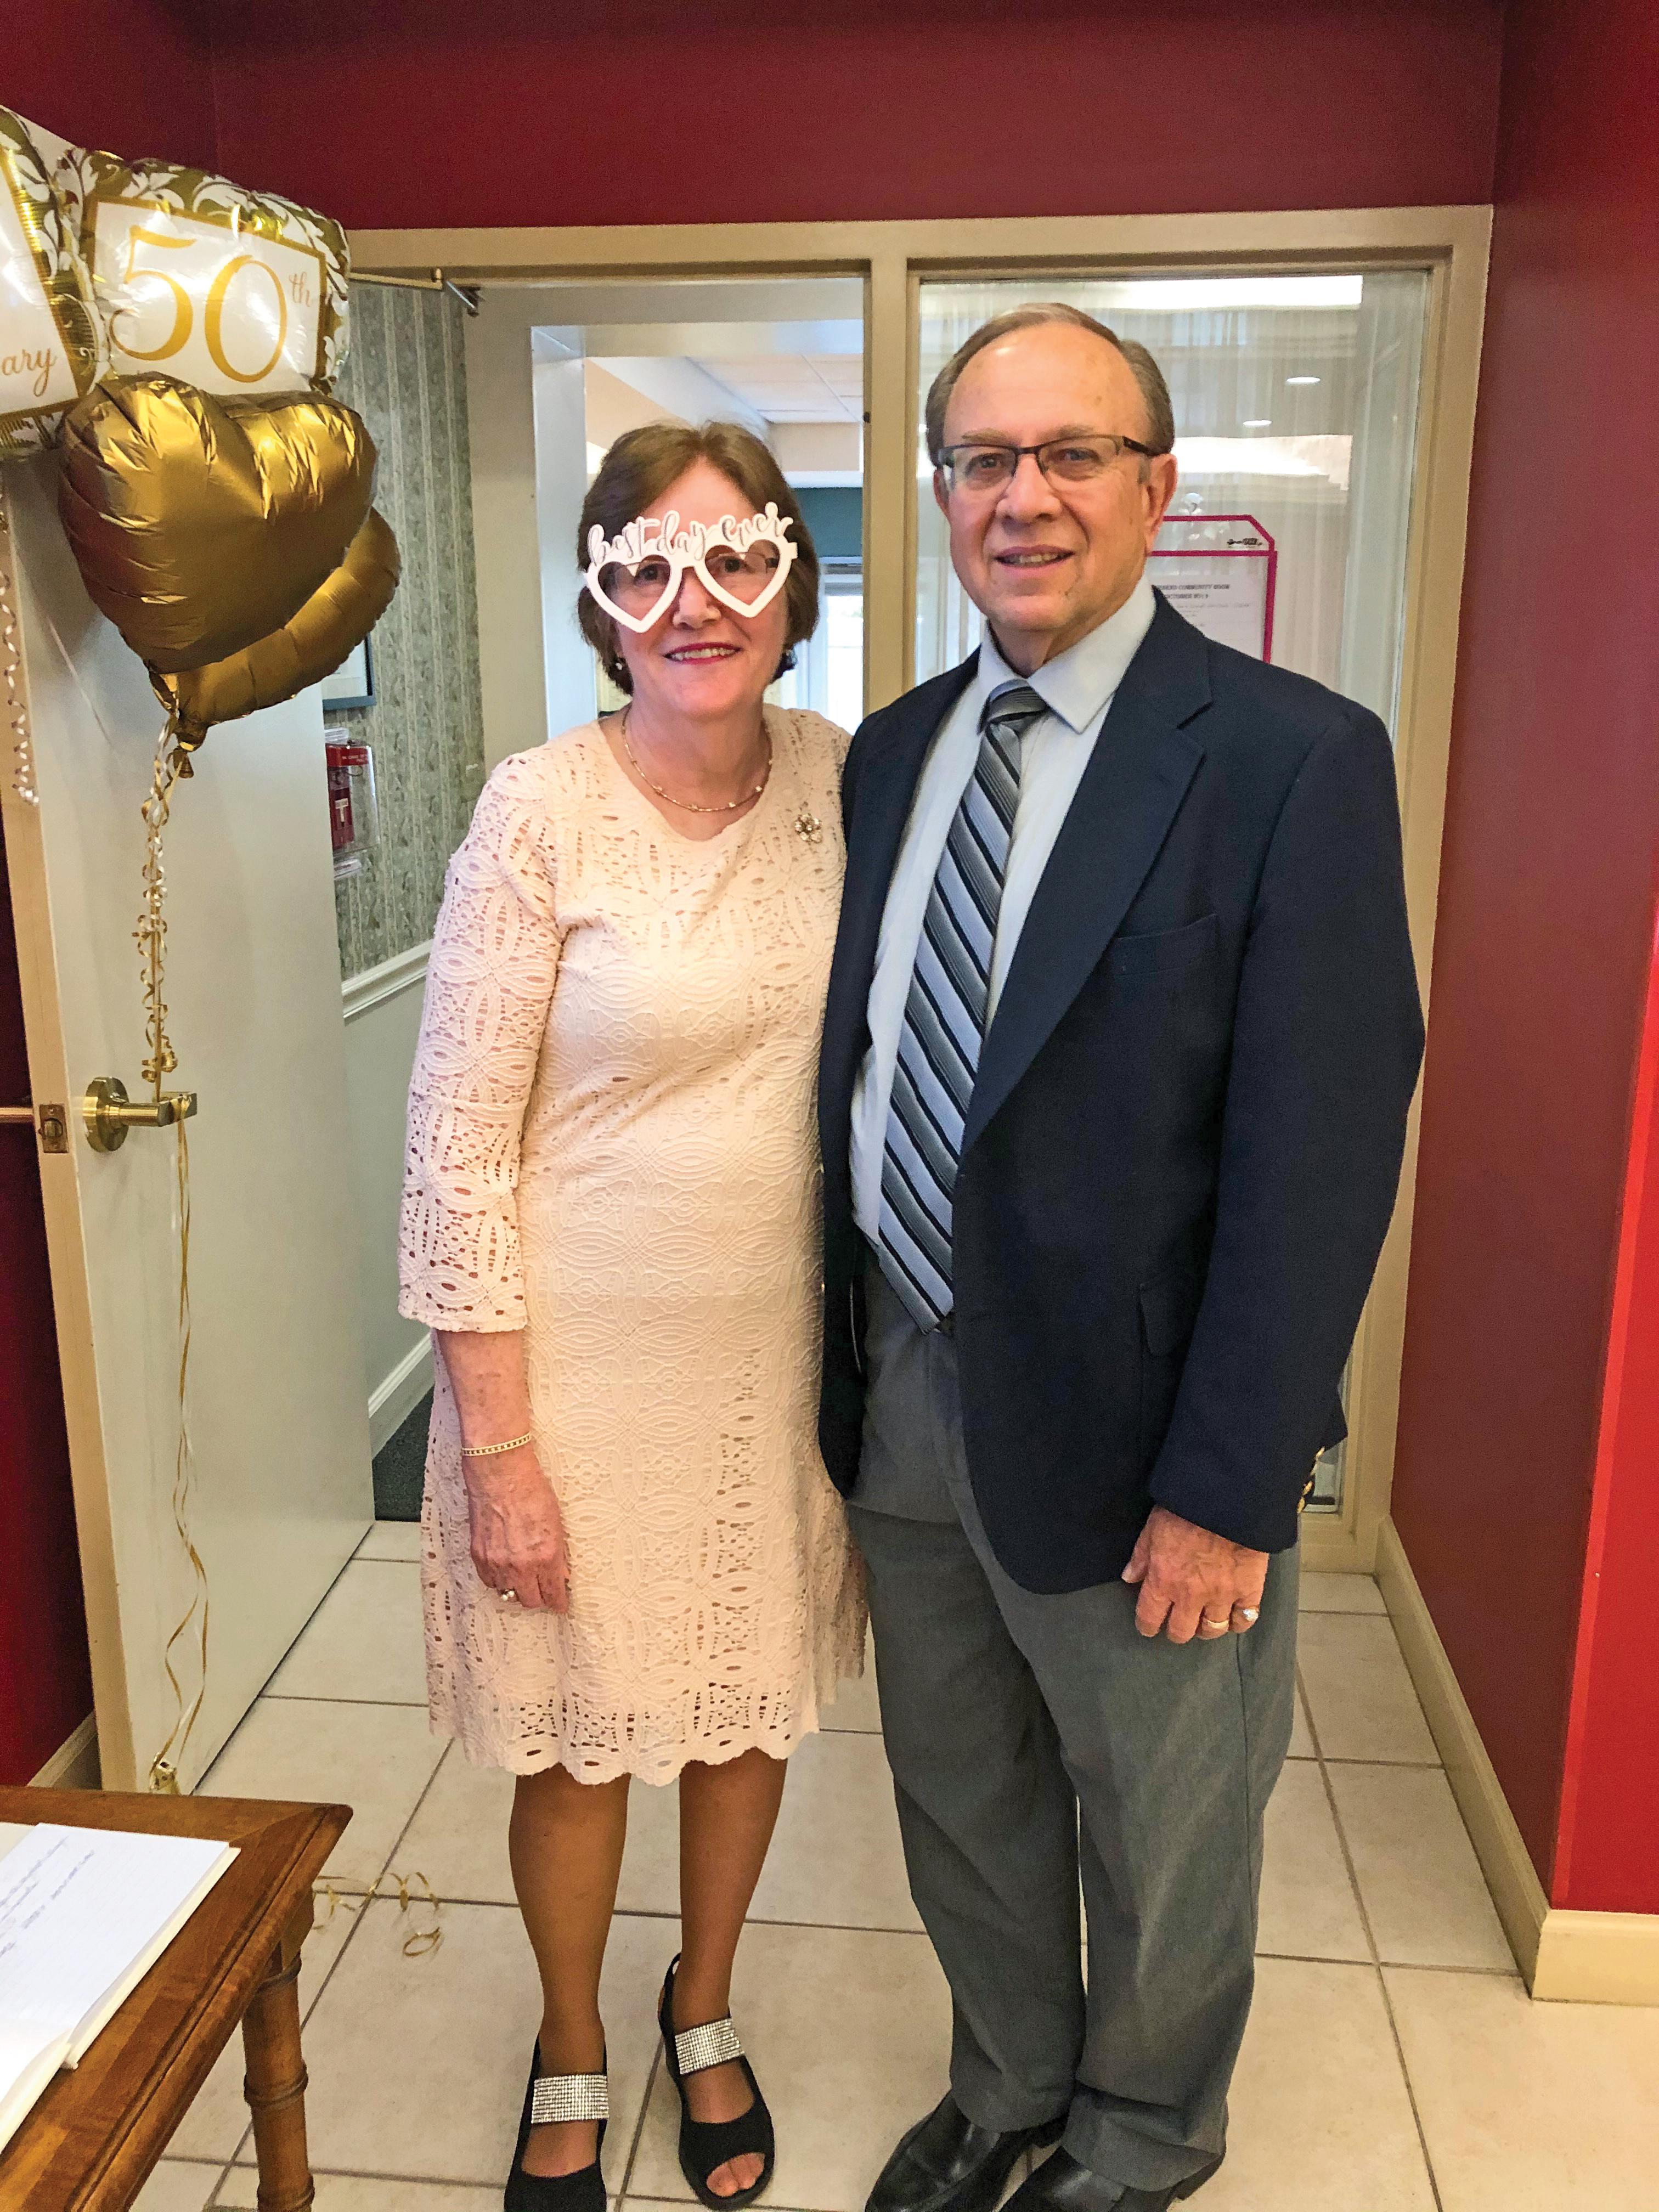 Shirley and Ken Aumack at their 50th wedding anniversary.